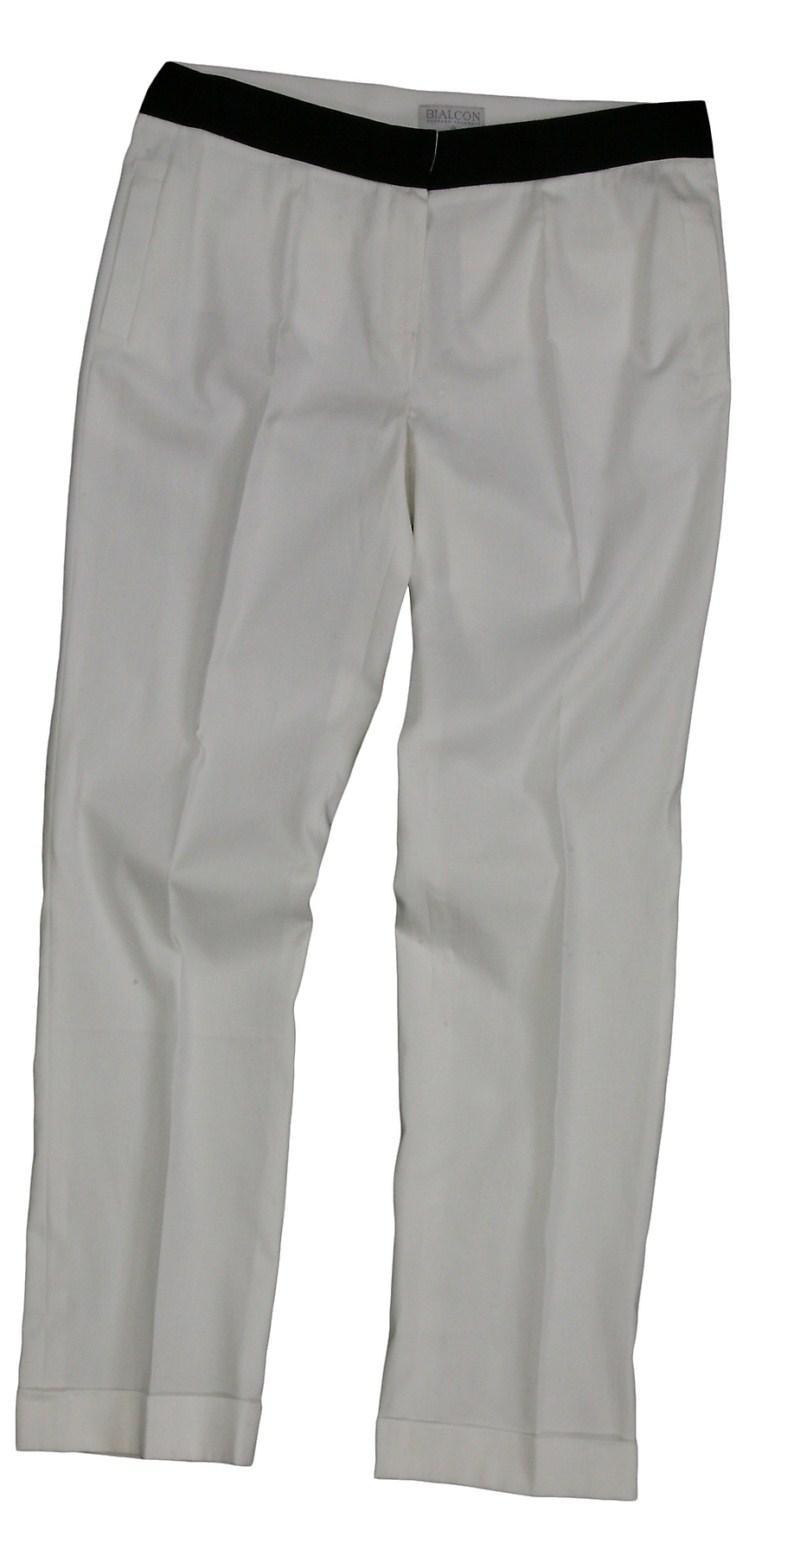 białe spodnie Bialcon - sezon wiosenno-letni